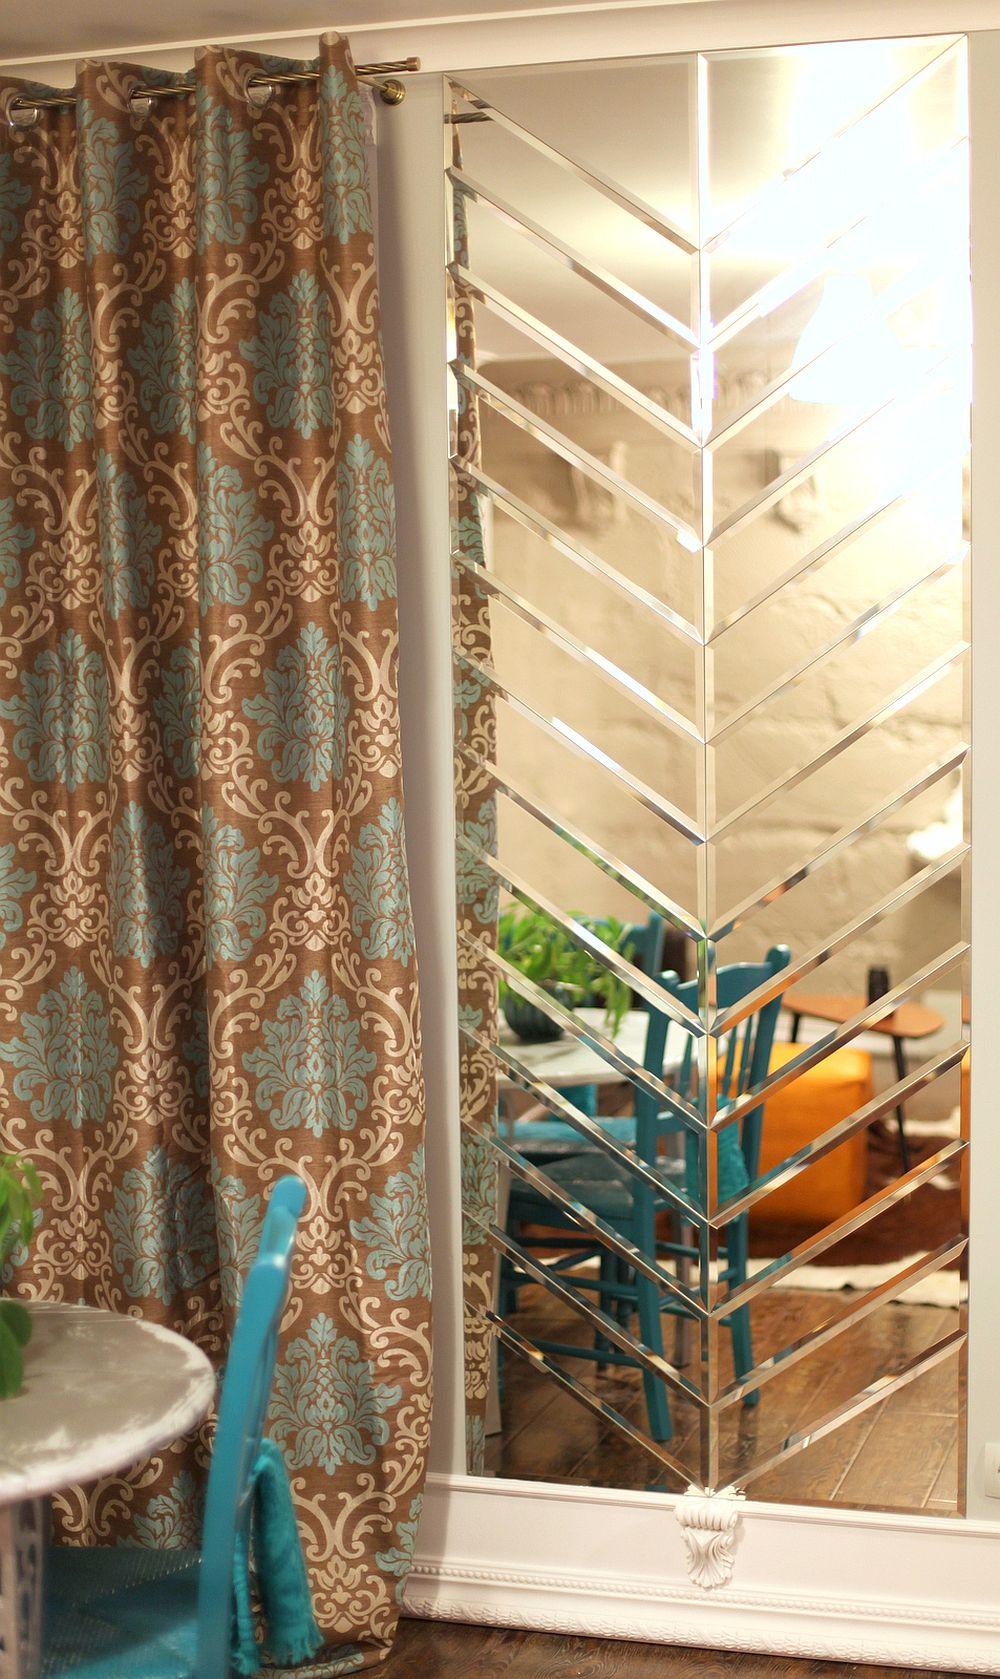 adelaparvu.com despre apartament 3 camere Bucuresti, designer Tanya Solomitchi (27)